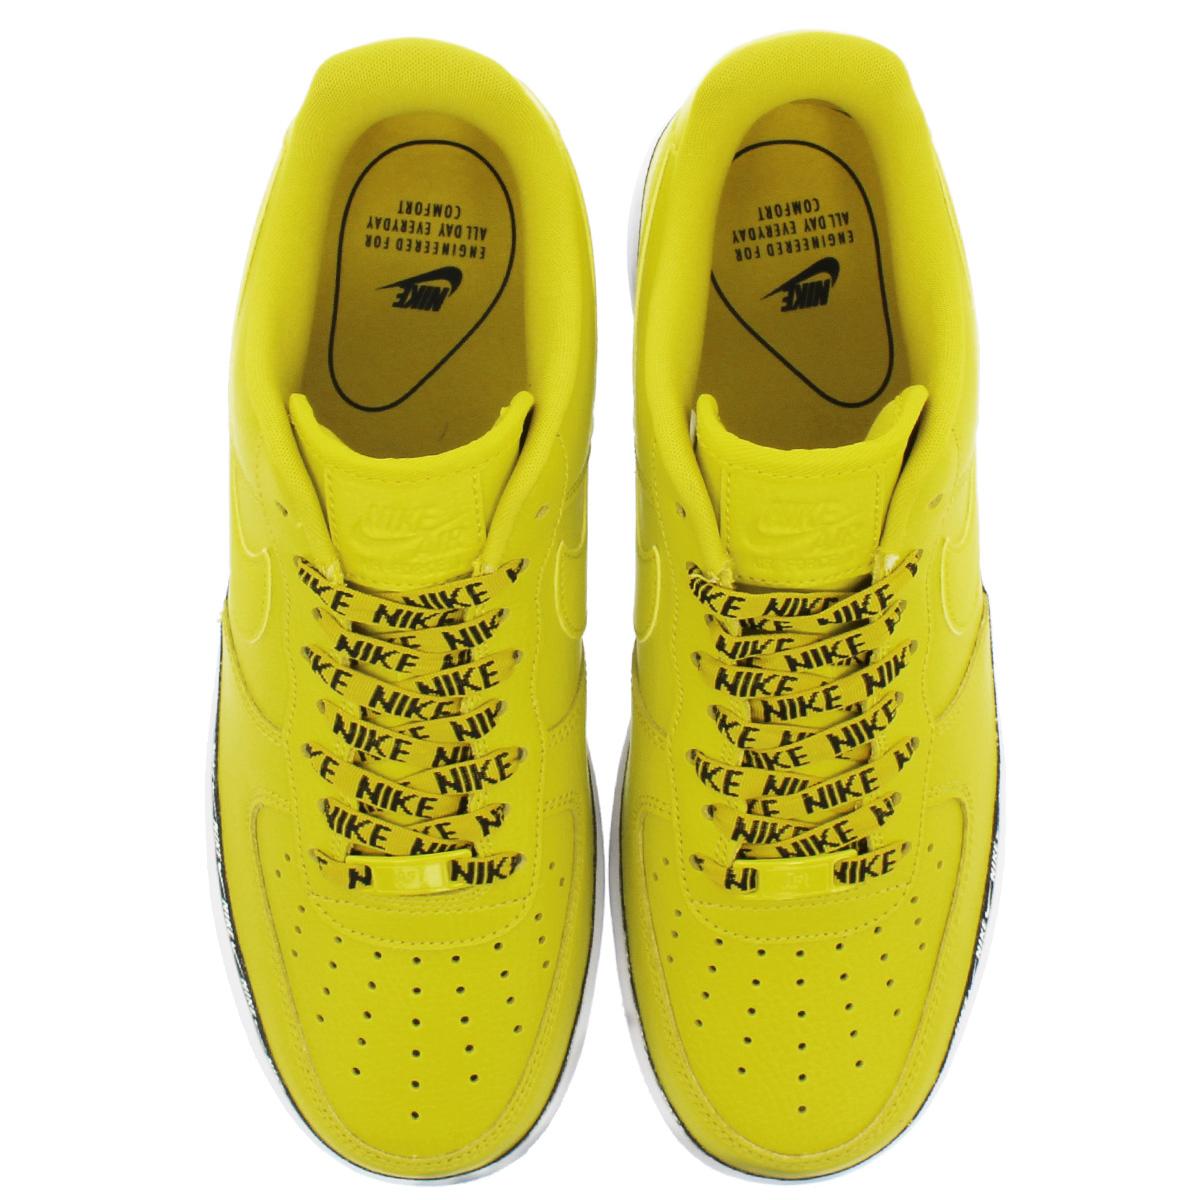 NIKE WMNS AIR FORCE 1 '07 SE PRM Nike women air force 1 '07 SE PRM BRIGHT CITRONBLACKWHITE ah6827 700